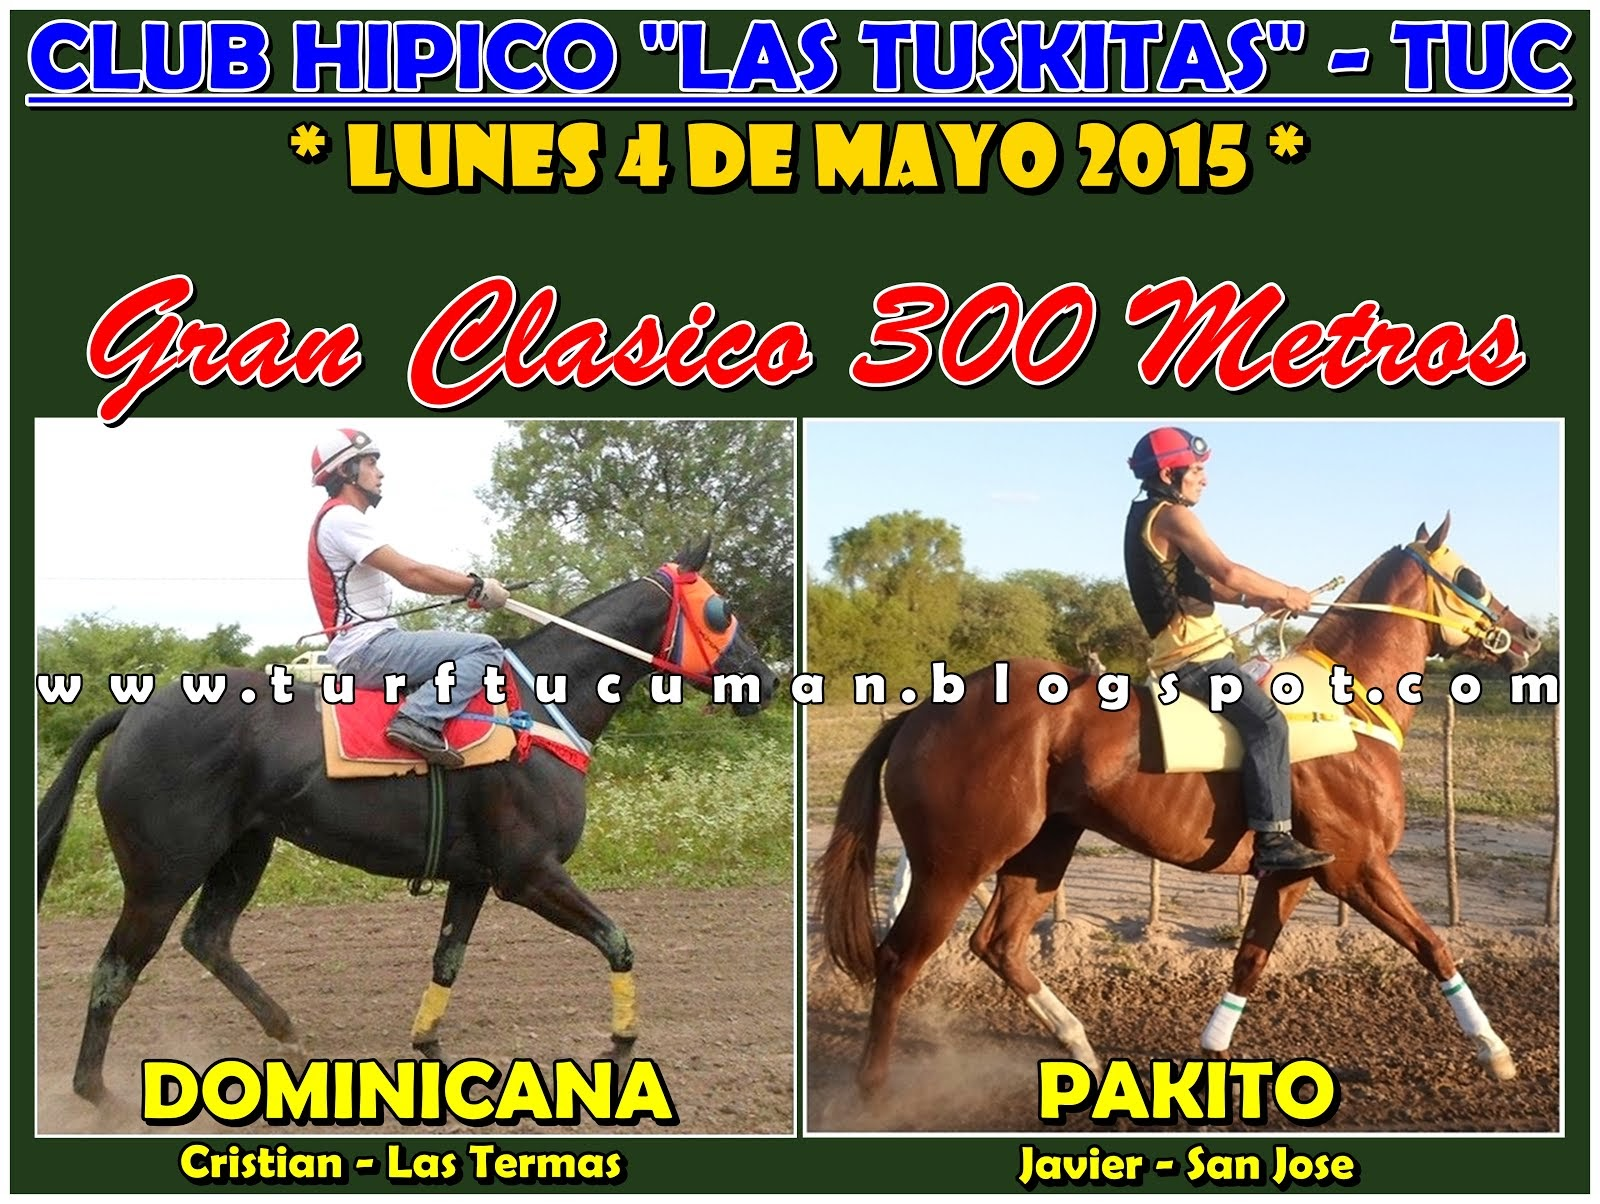 DOMINICANA VS PACKITO